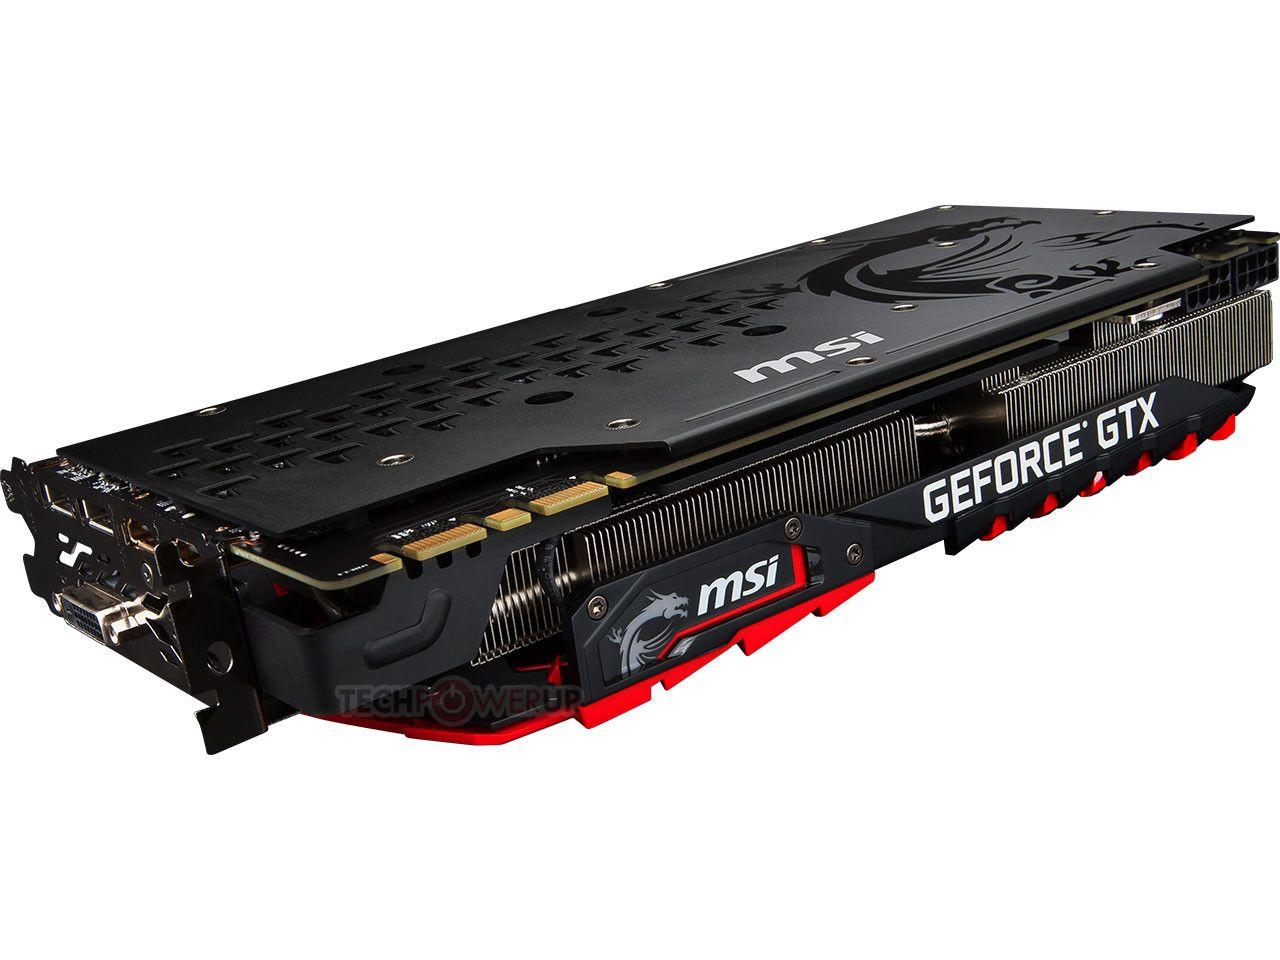 Msi Announces Geforce Gtx 1080 Ti Gaming X Graphics Card Graphic Card Msi Games